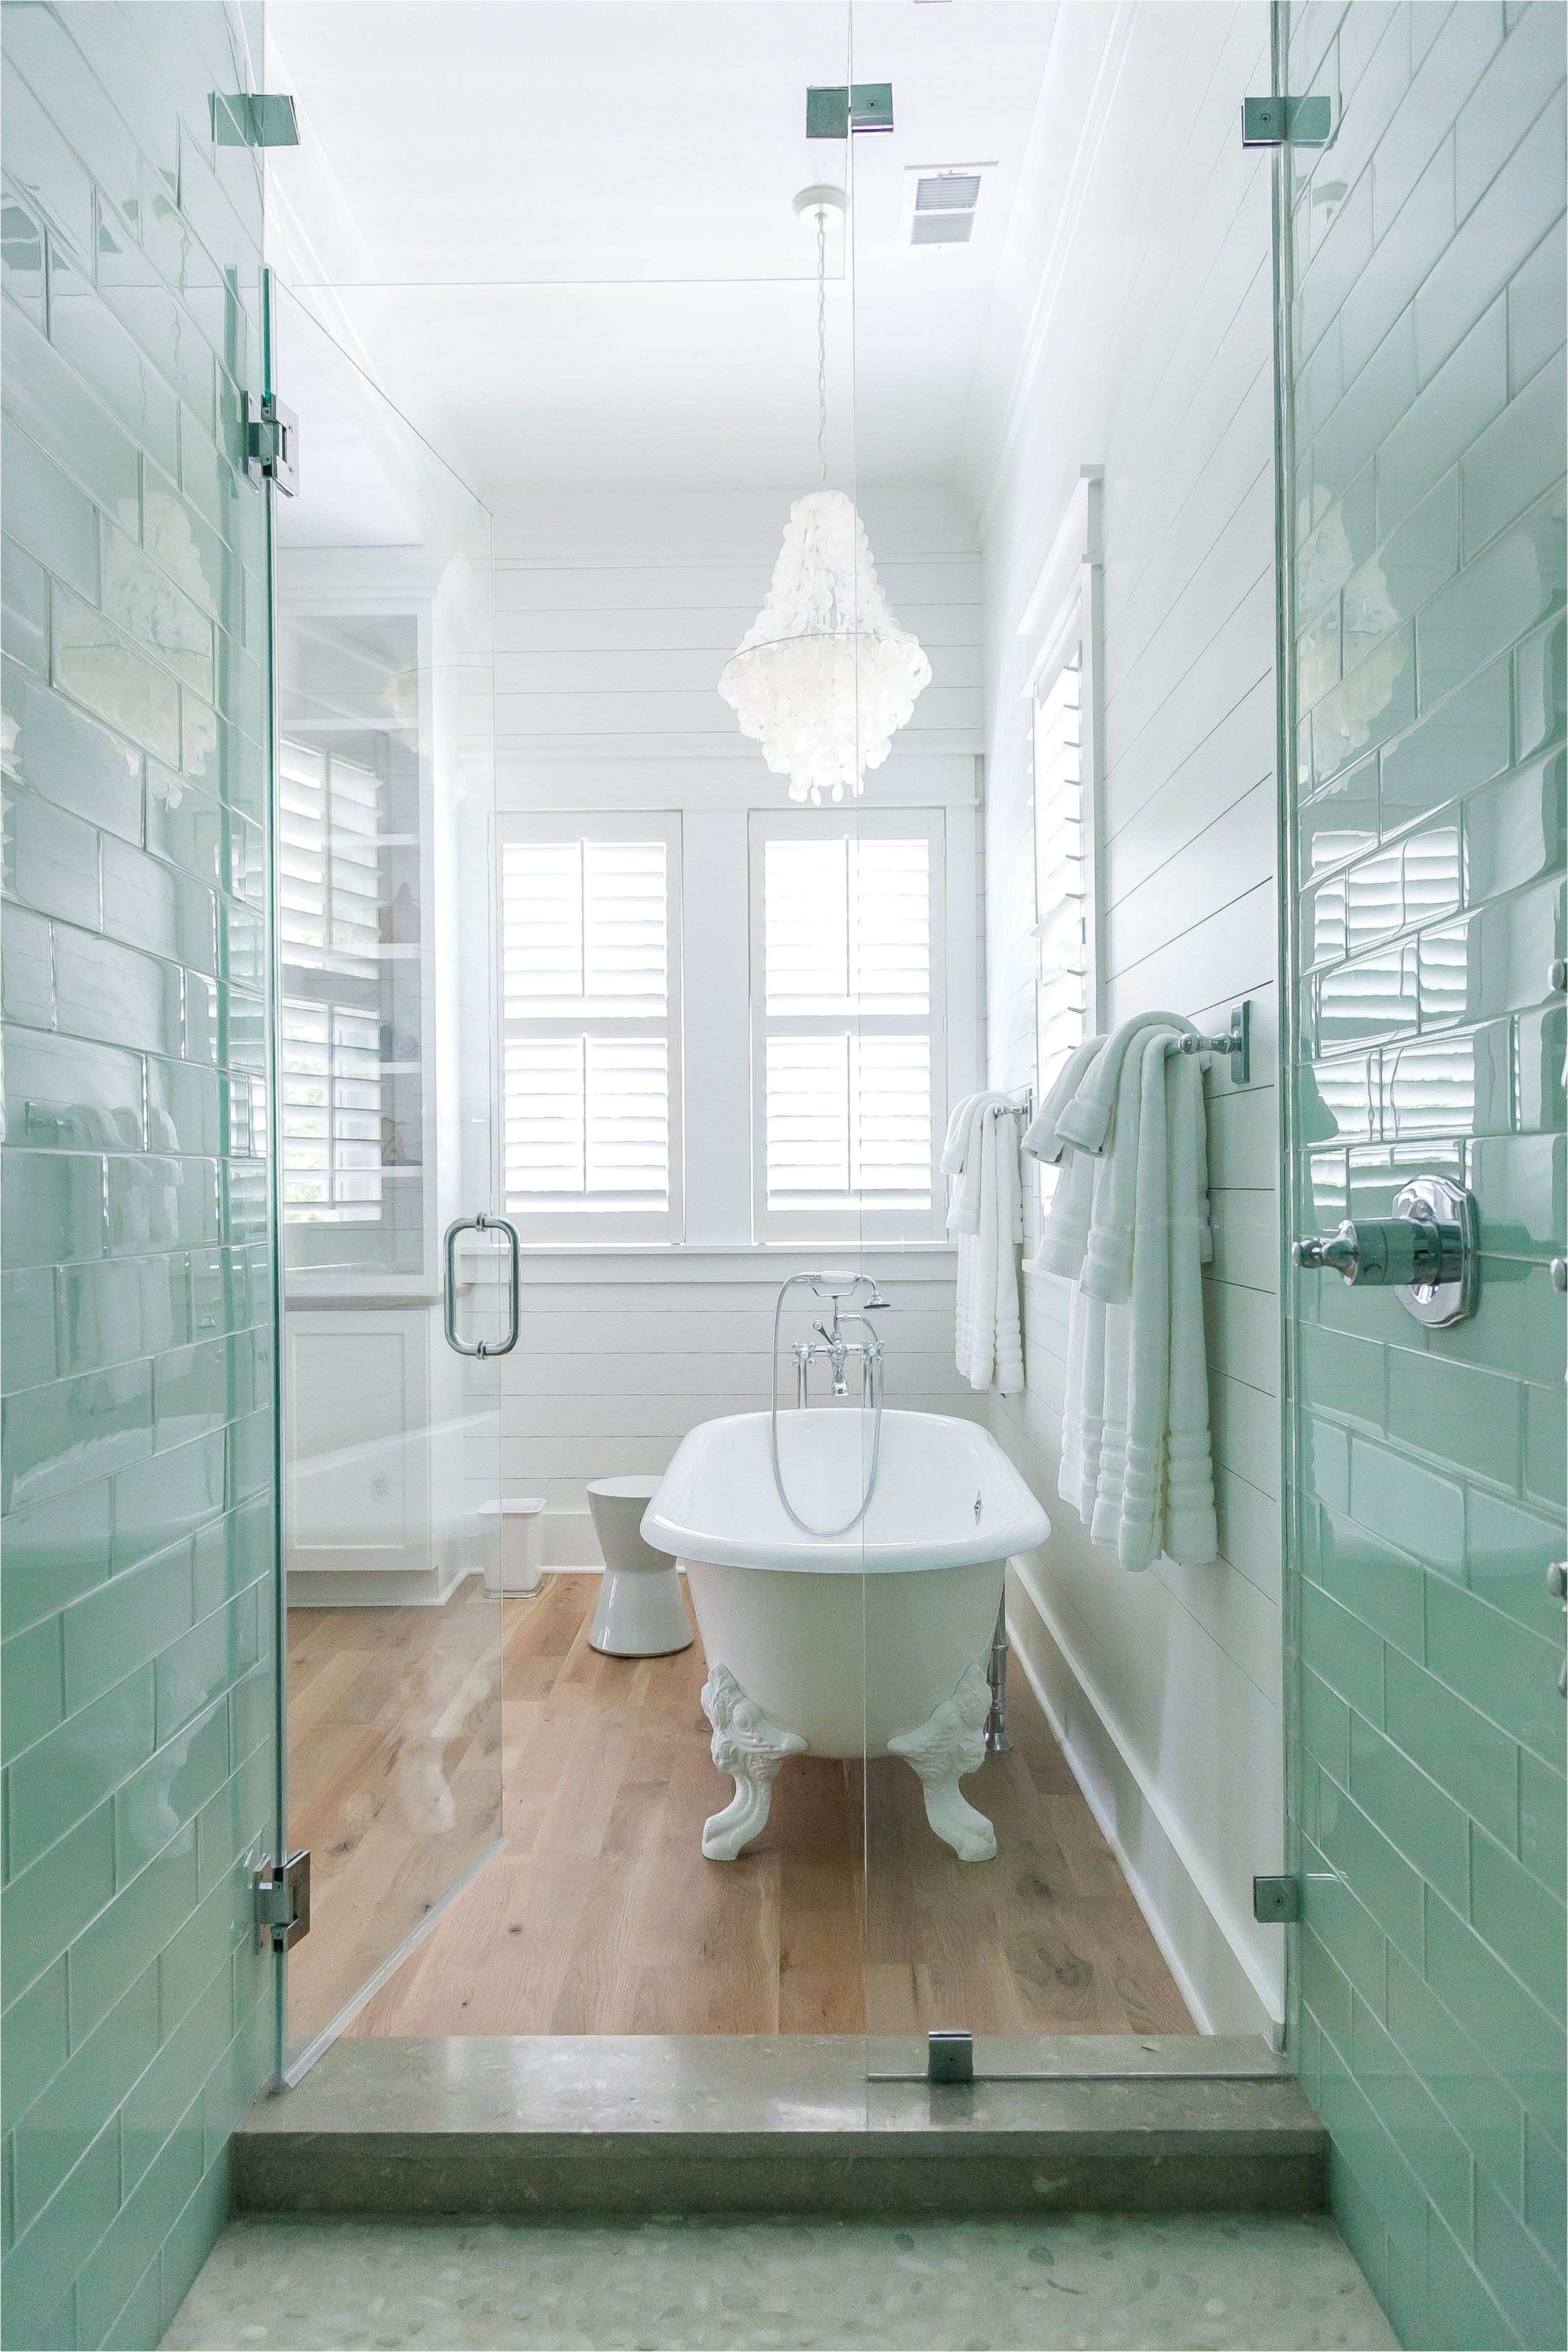 master bathroom lighting luxury bathroom shower light new h sink install bathroom i 0d exciting diy